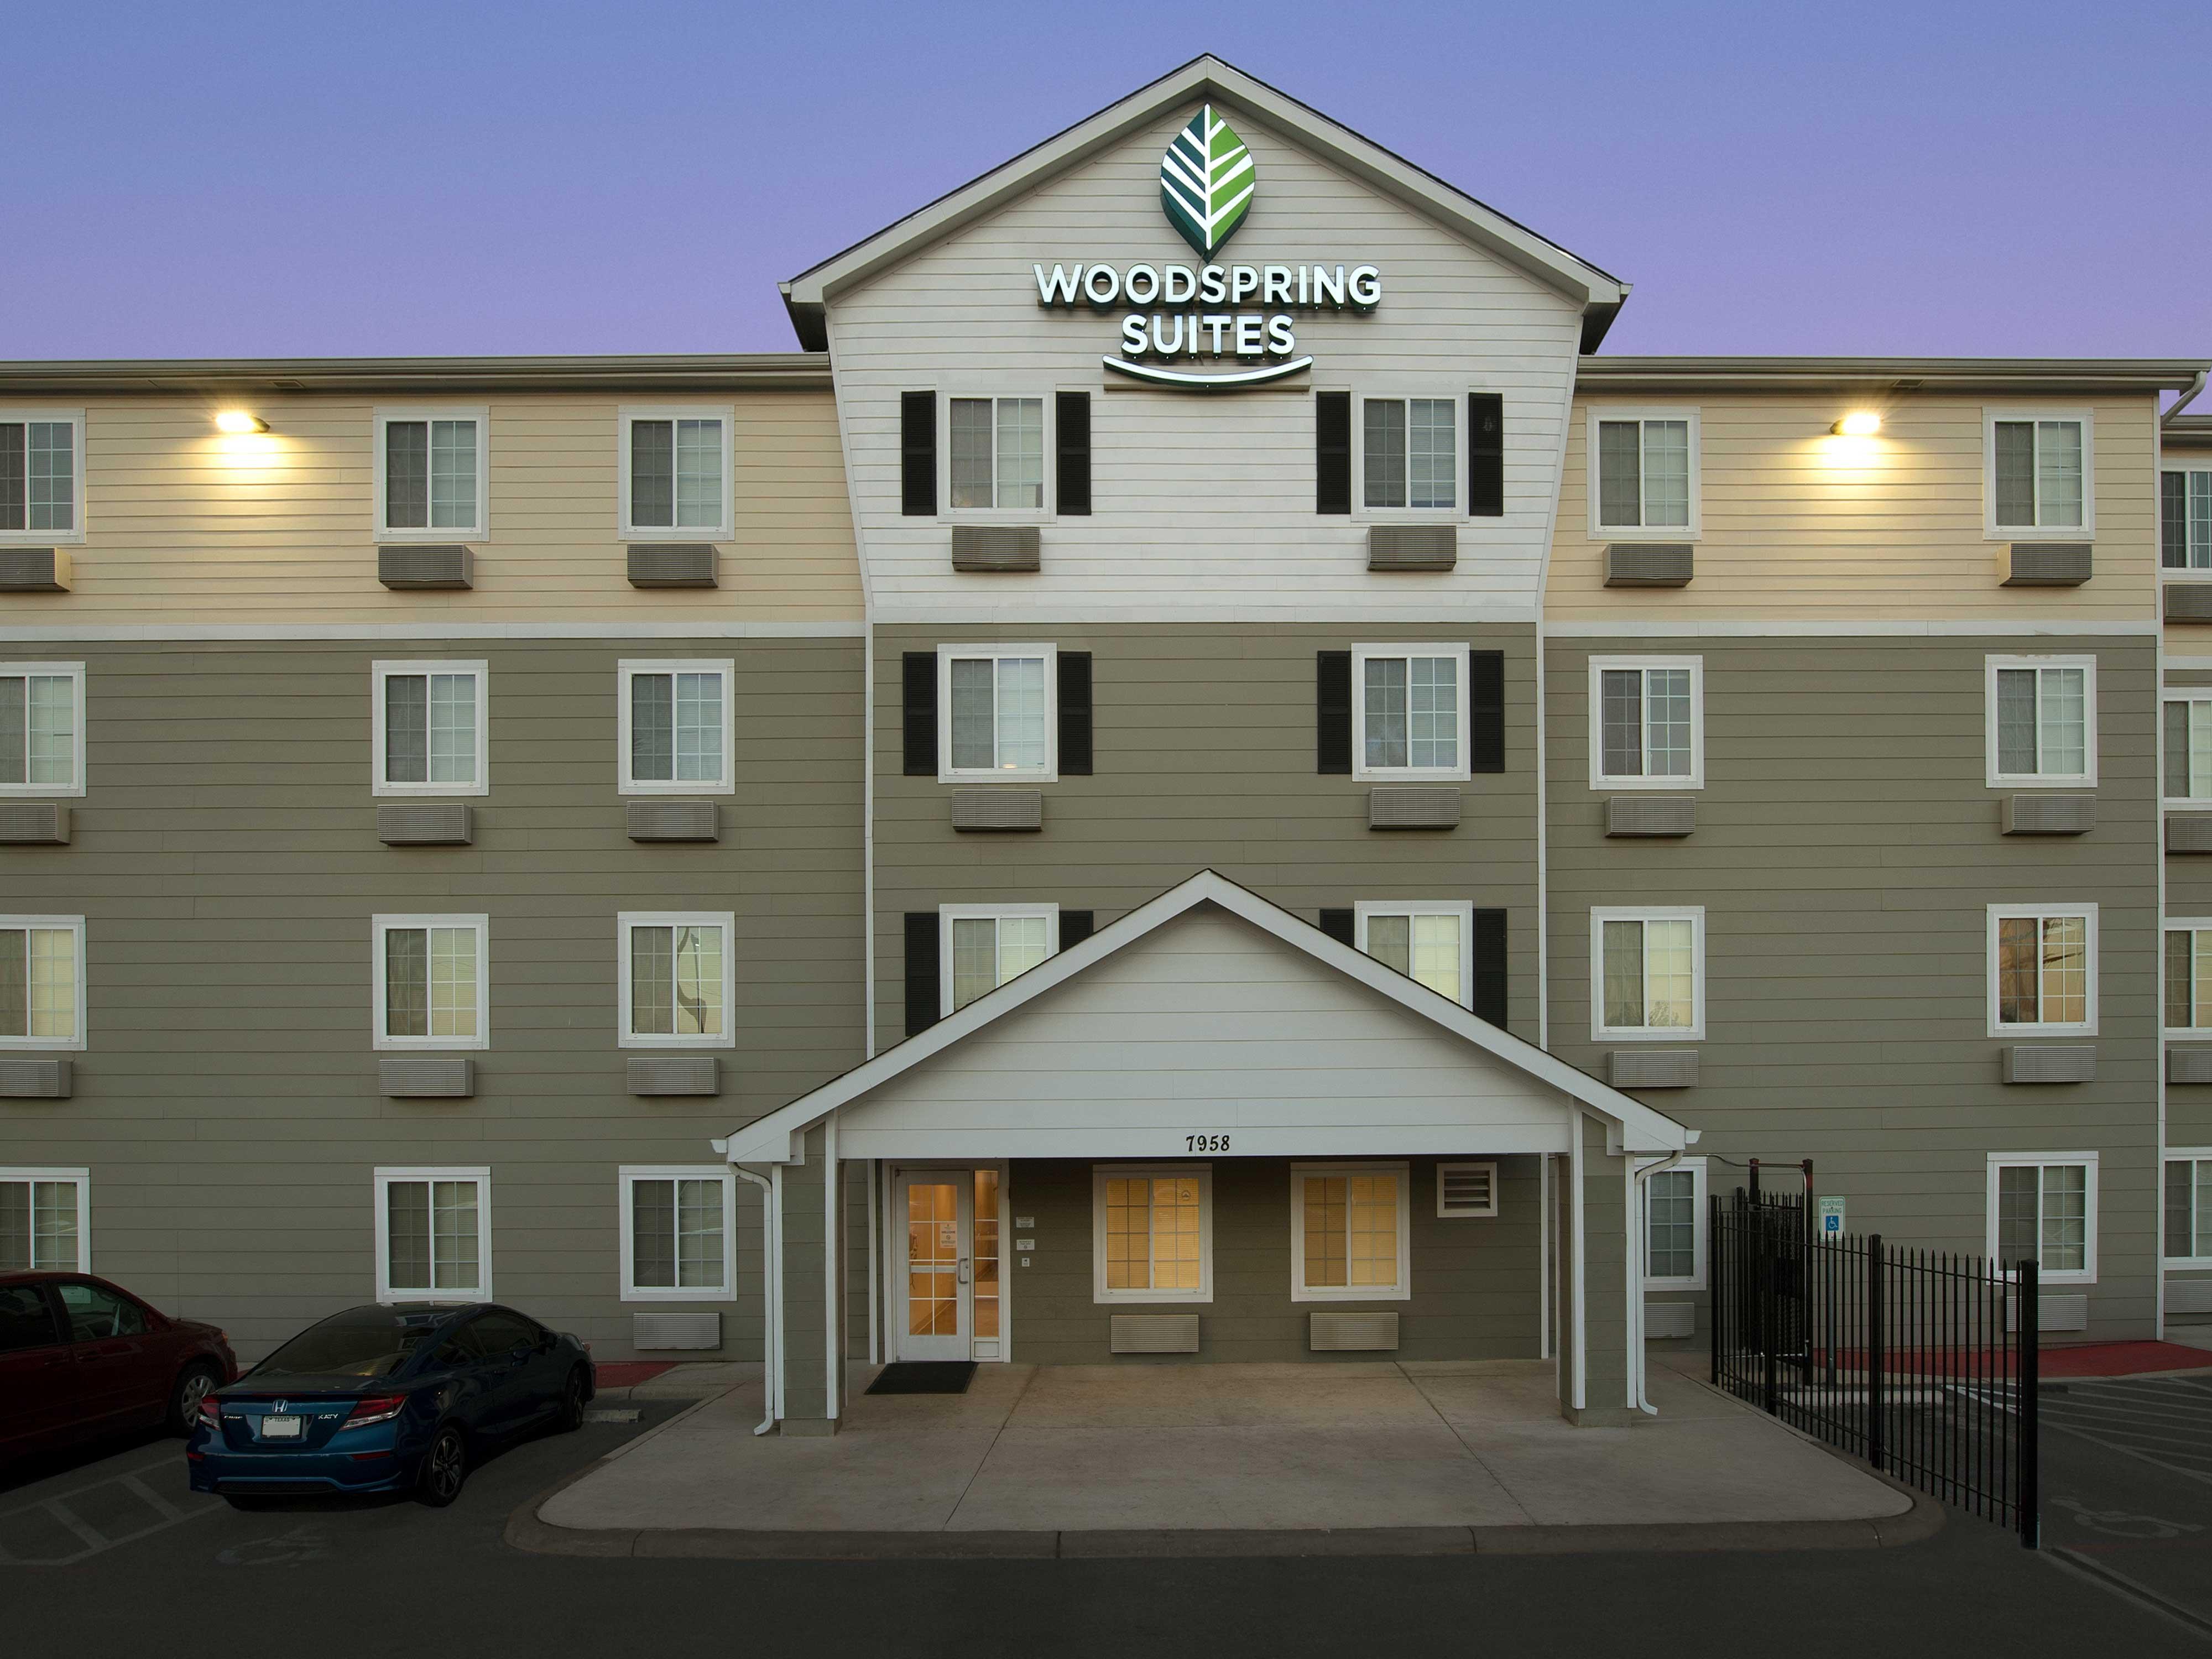 WoodSpring Suites San Antonio South image 19